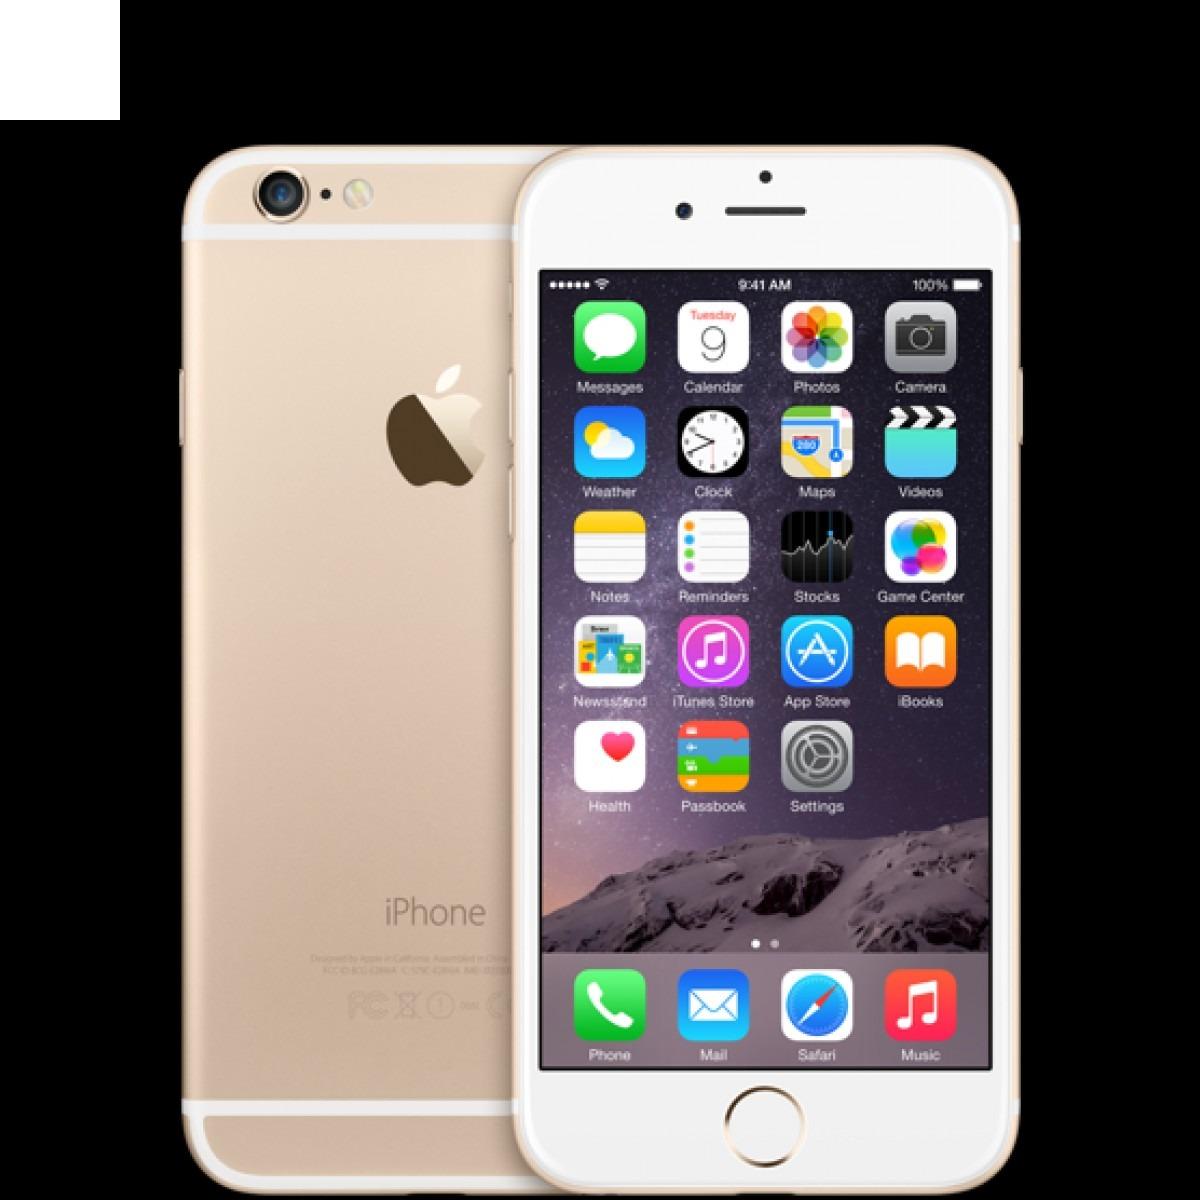 apple iphone 6 64 gb lacrado na caixa a1549 r. Black Bedroom Furniture Sets. Home Design Ideas